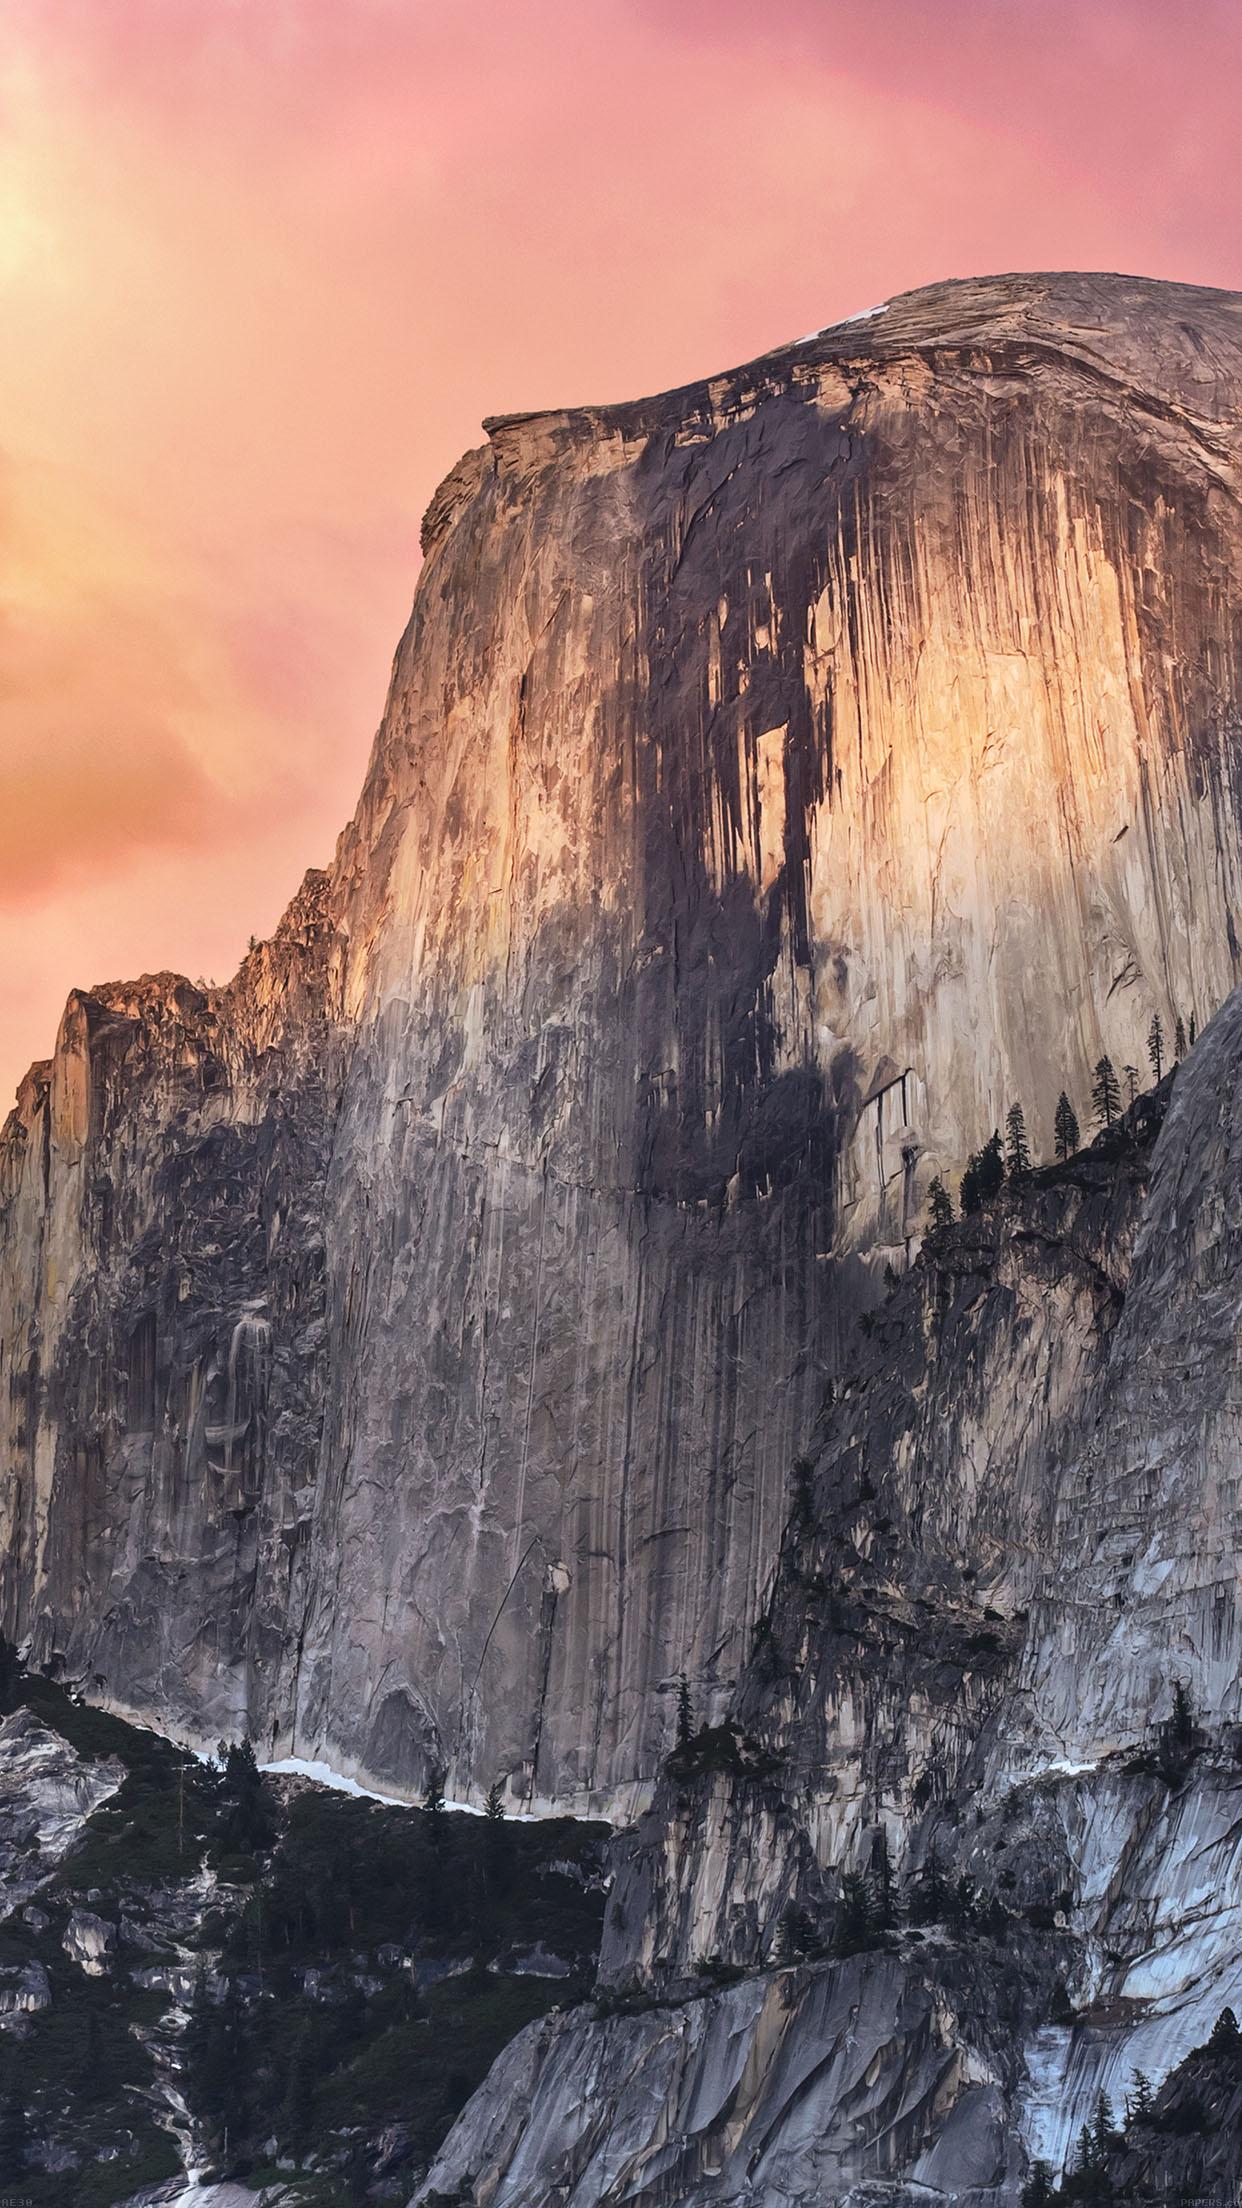 Papersco Iphone Wallpaper Ae30 Yosemite Mac Wallpaper Os X